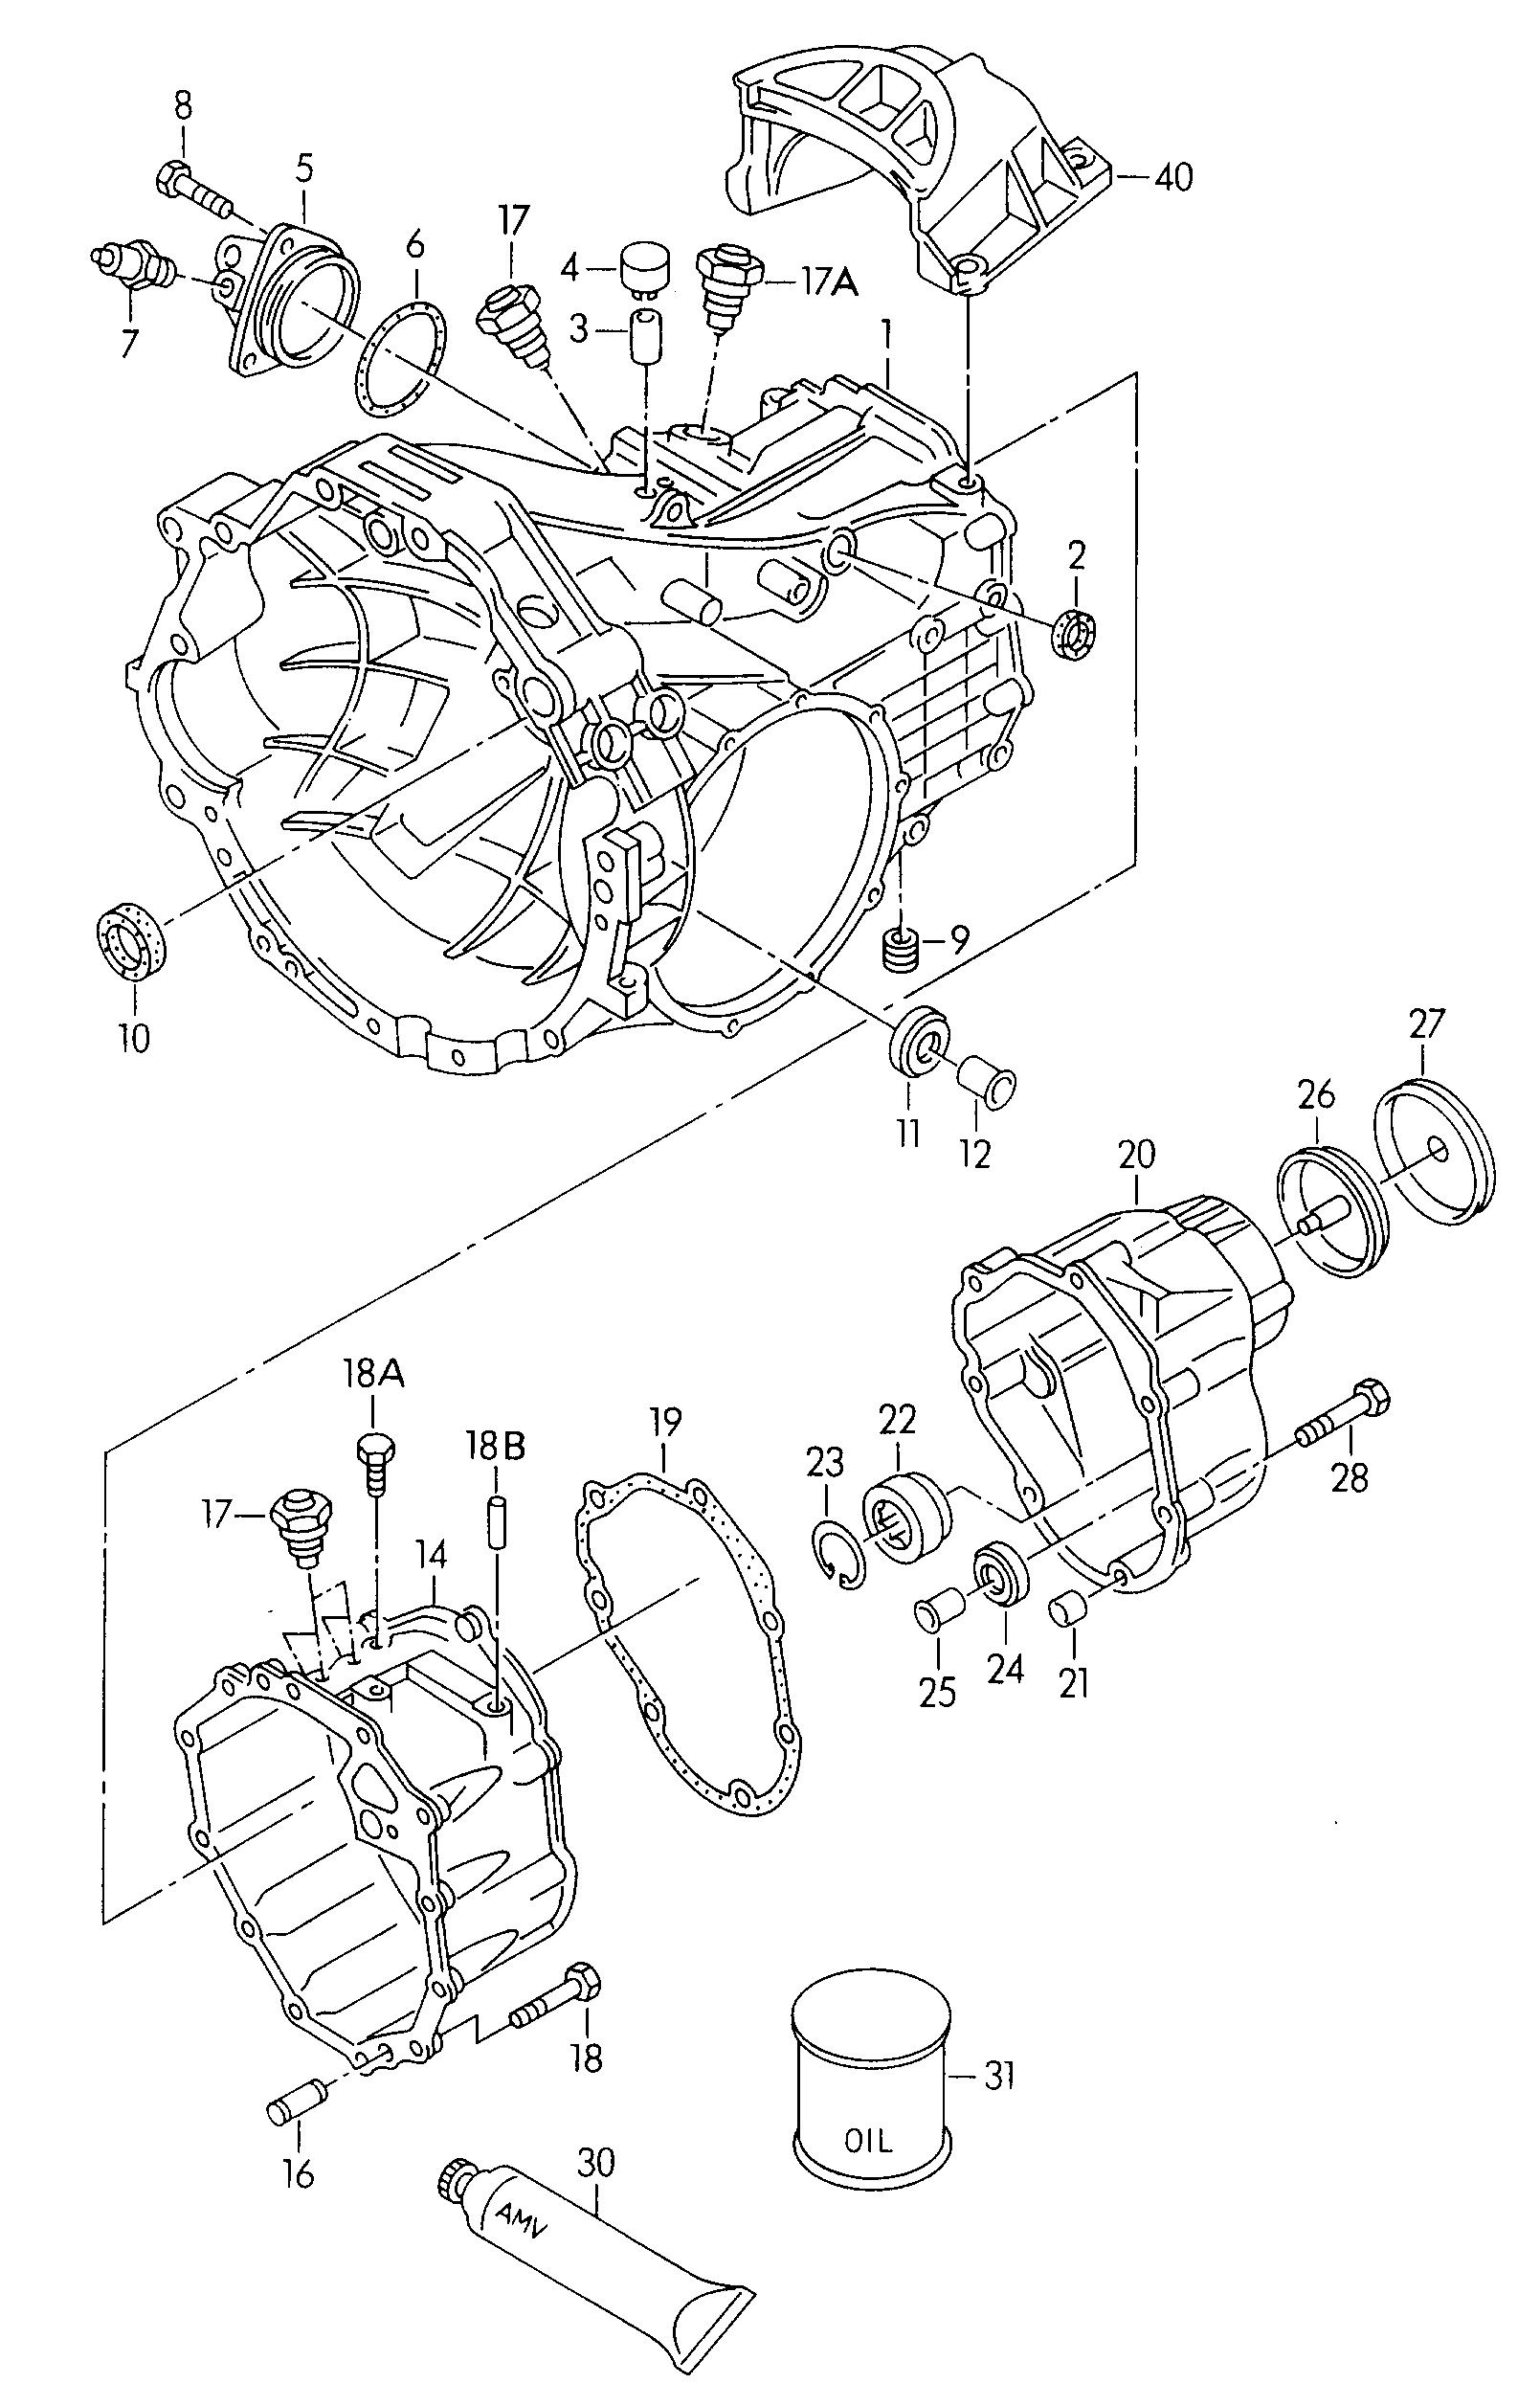 Audi A4/Avant (1999 - 2002) - gear housing  for 5 speed manual